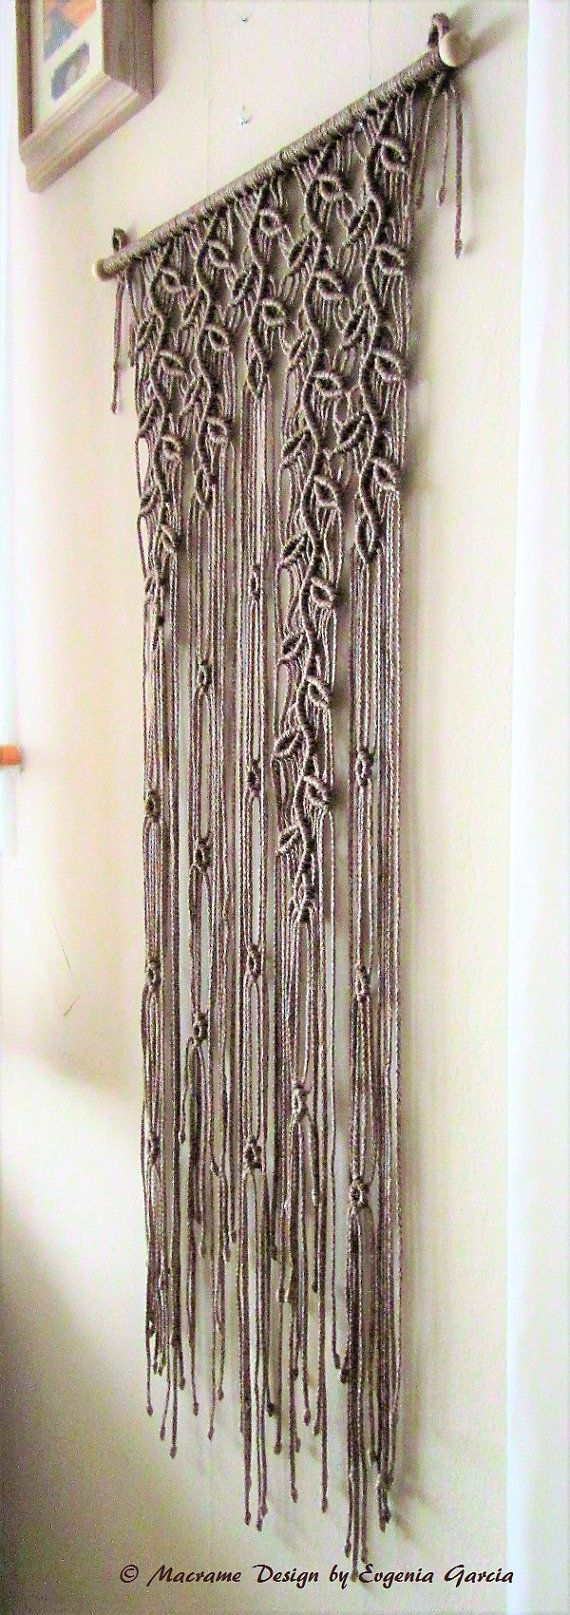 Macrame Wall Hanging - Sprigs #5 - Handmade Macrame Home ...